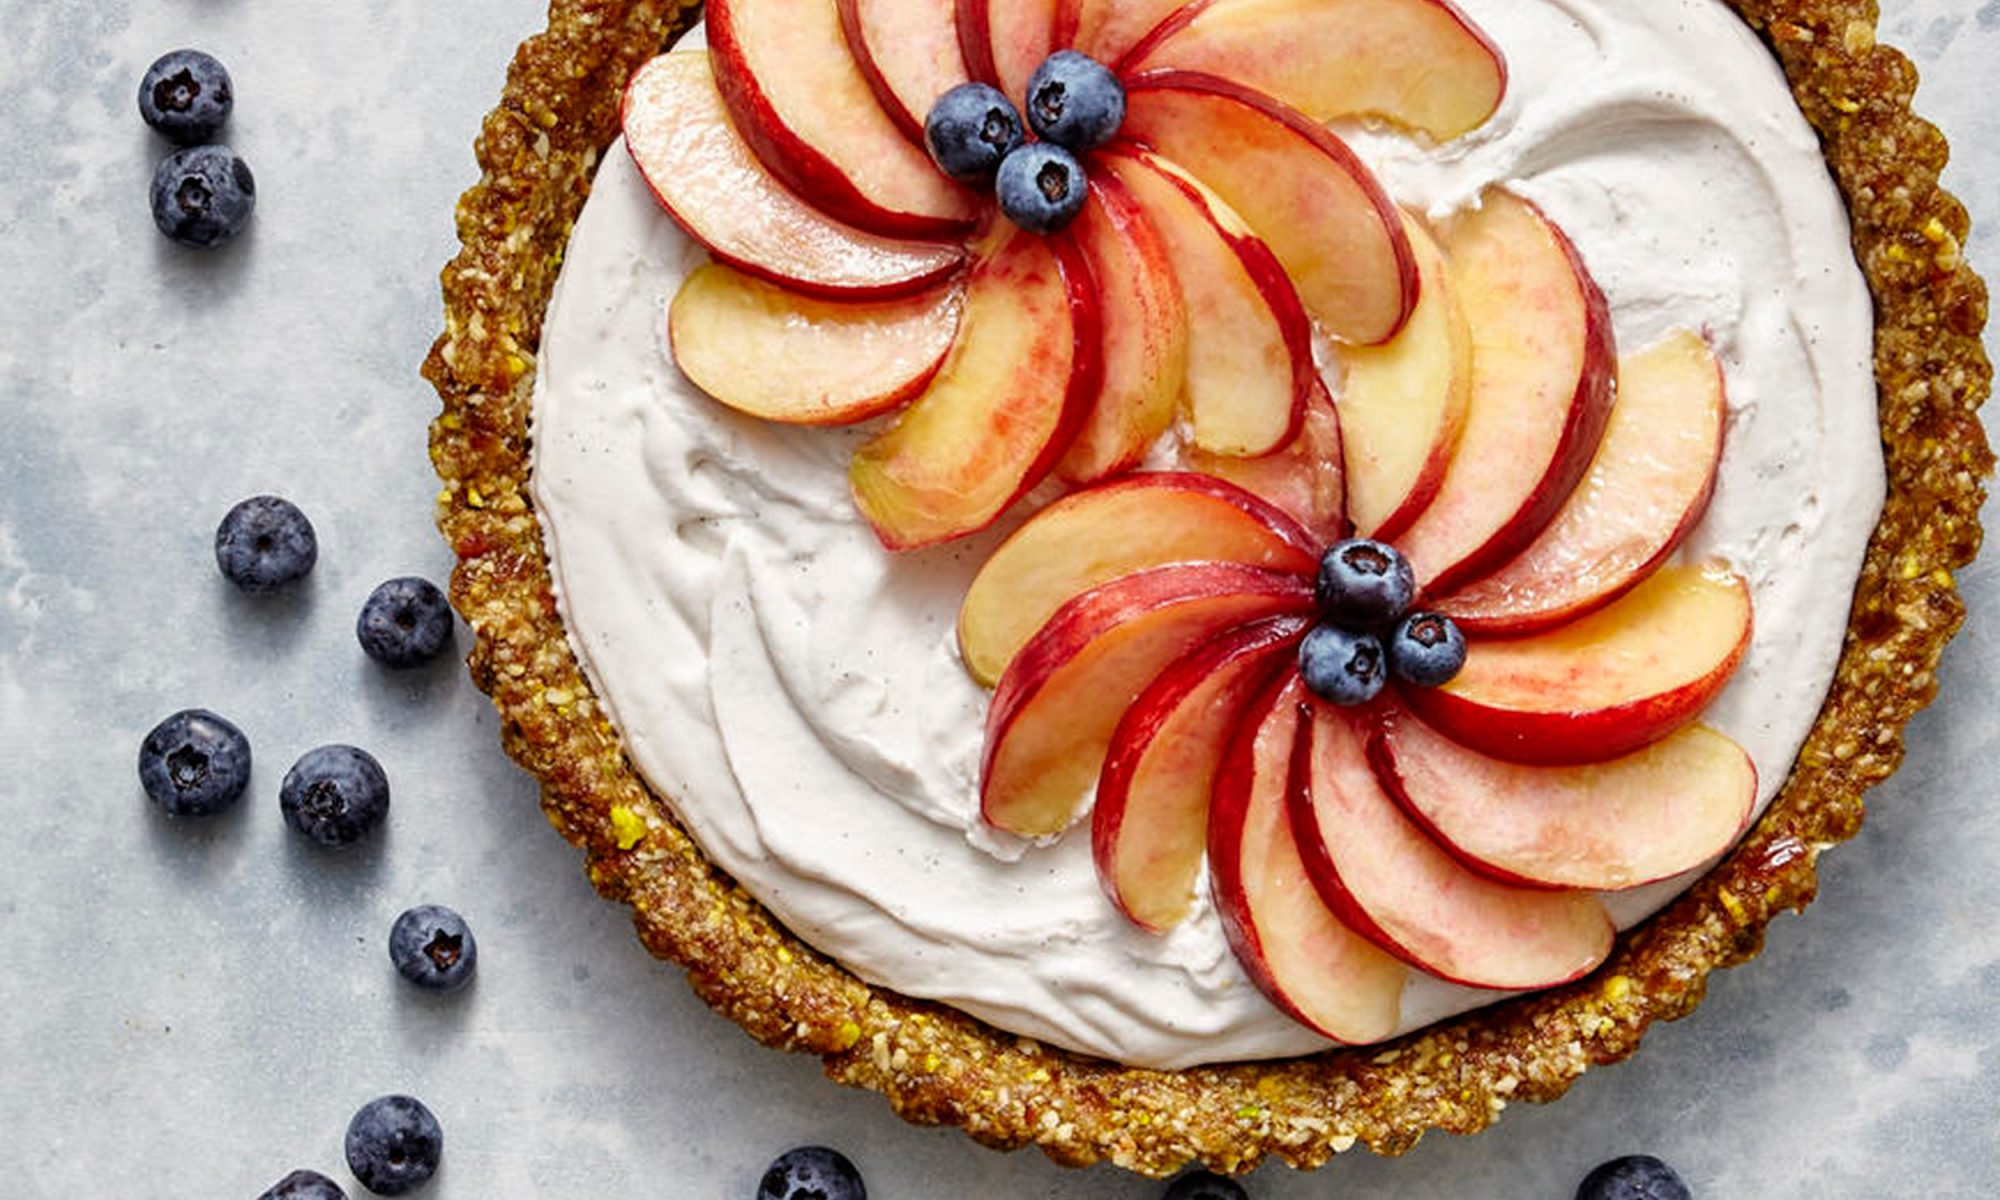 EC: Vegan Coconut Cream Tart with White Peaches and Blueberries